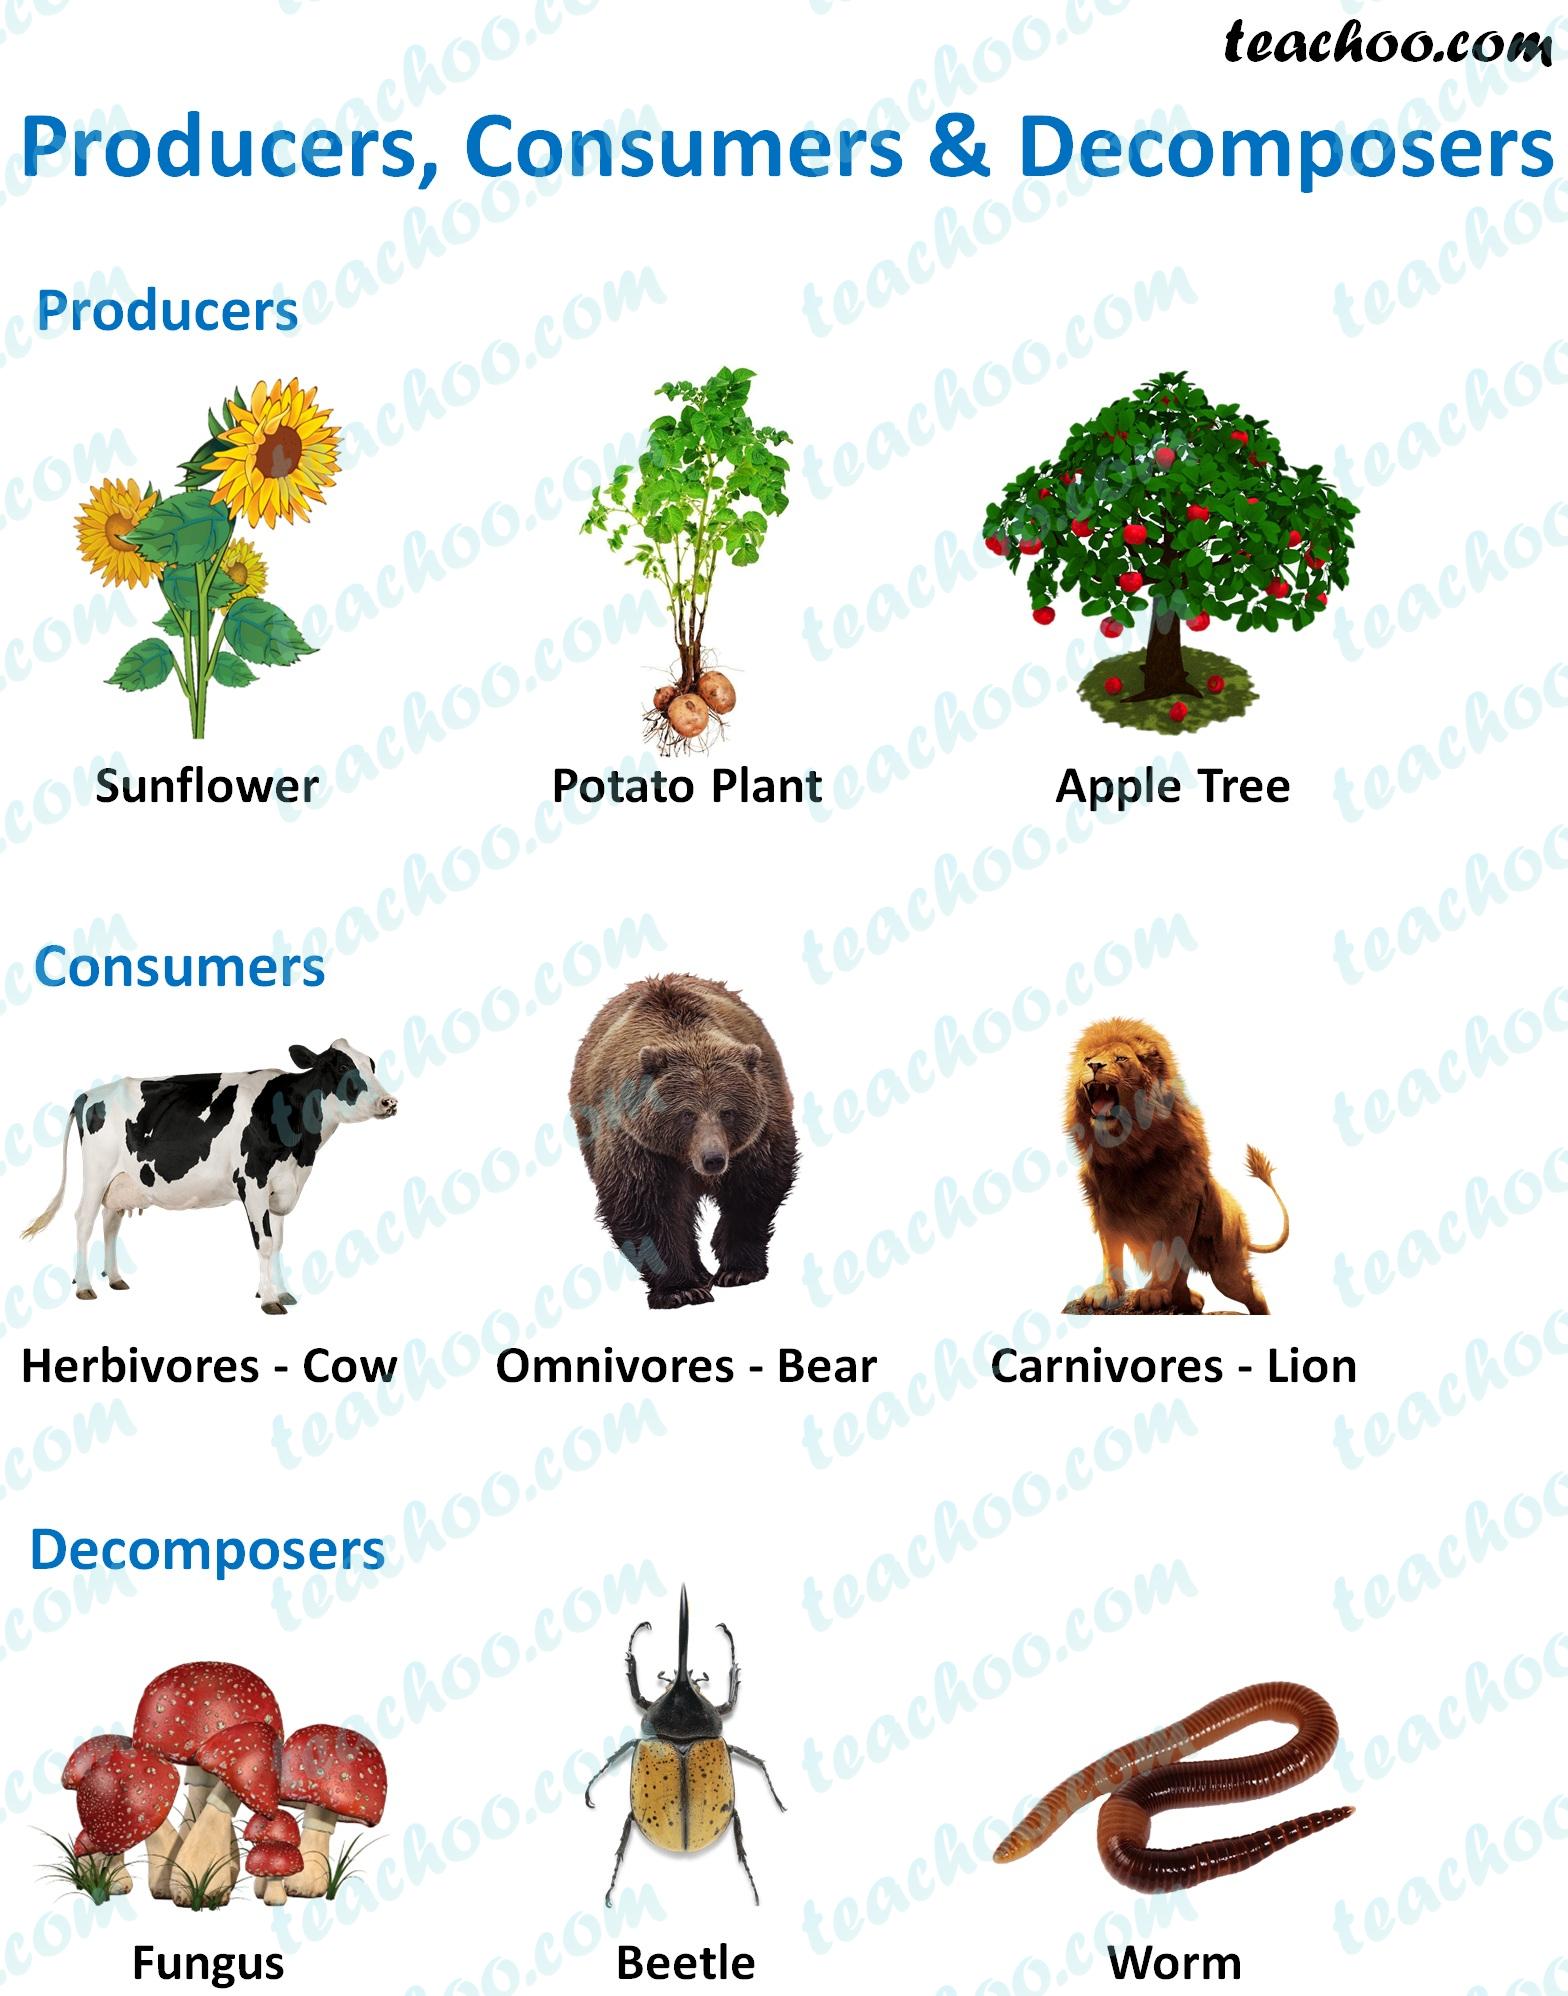 producers,-consumers-&-decomposers-example---teachoo.jpg